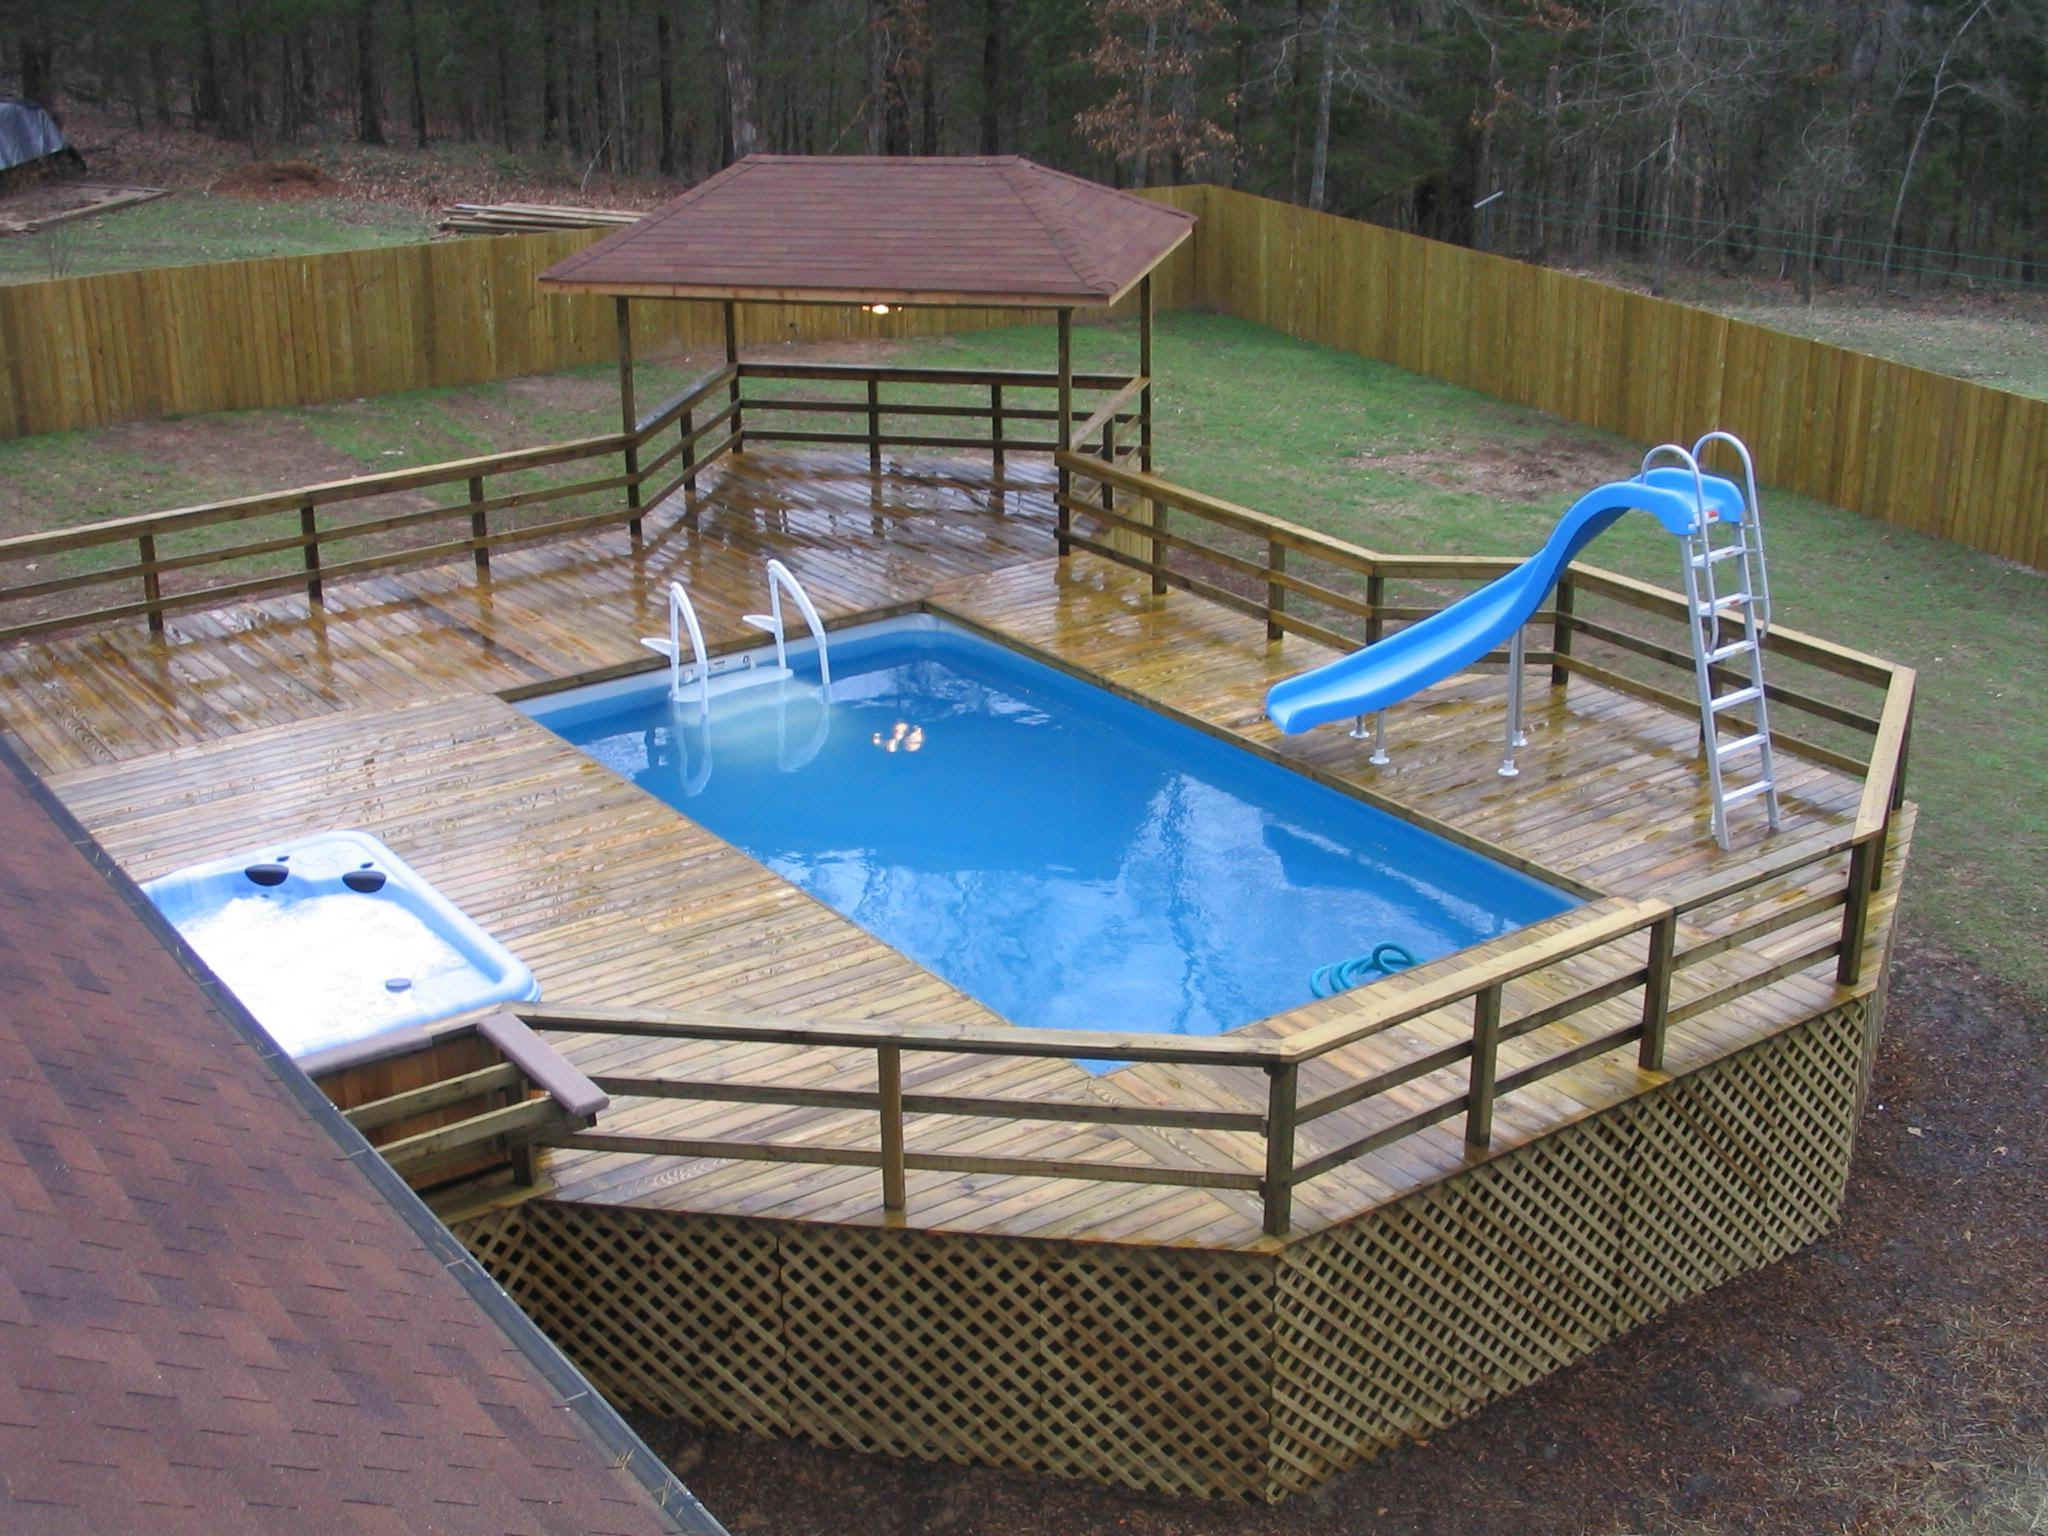 In Deck Recangular Swimming Pool Wooden Floor Small Gazebo Refreshing Jacuzzi